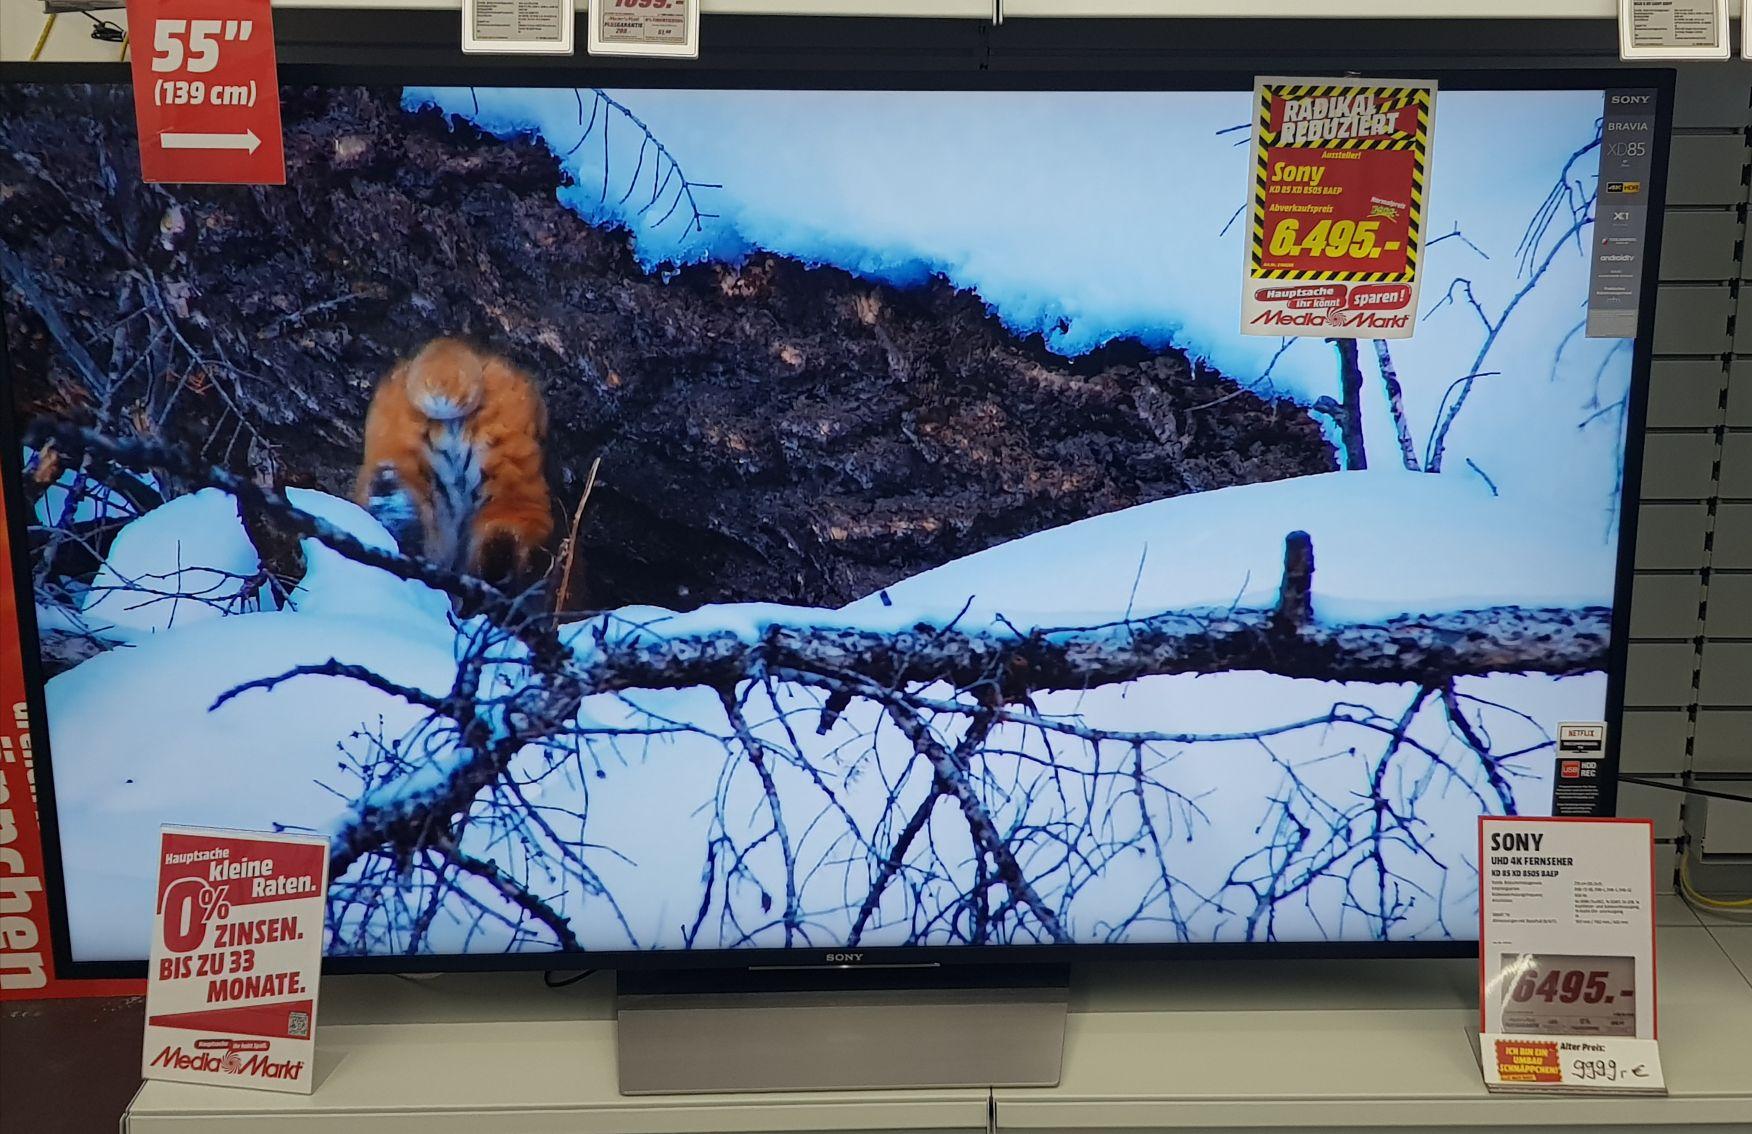 SONY KD85XD8505 LED UHD 4K Smart TV Media Markt Braunschweig